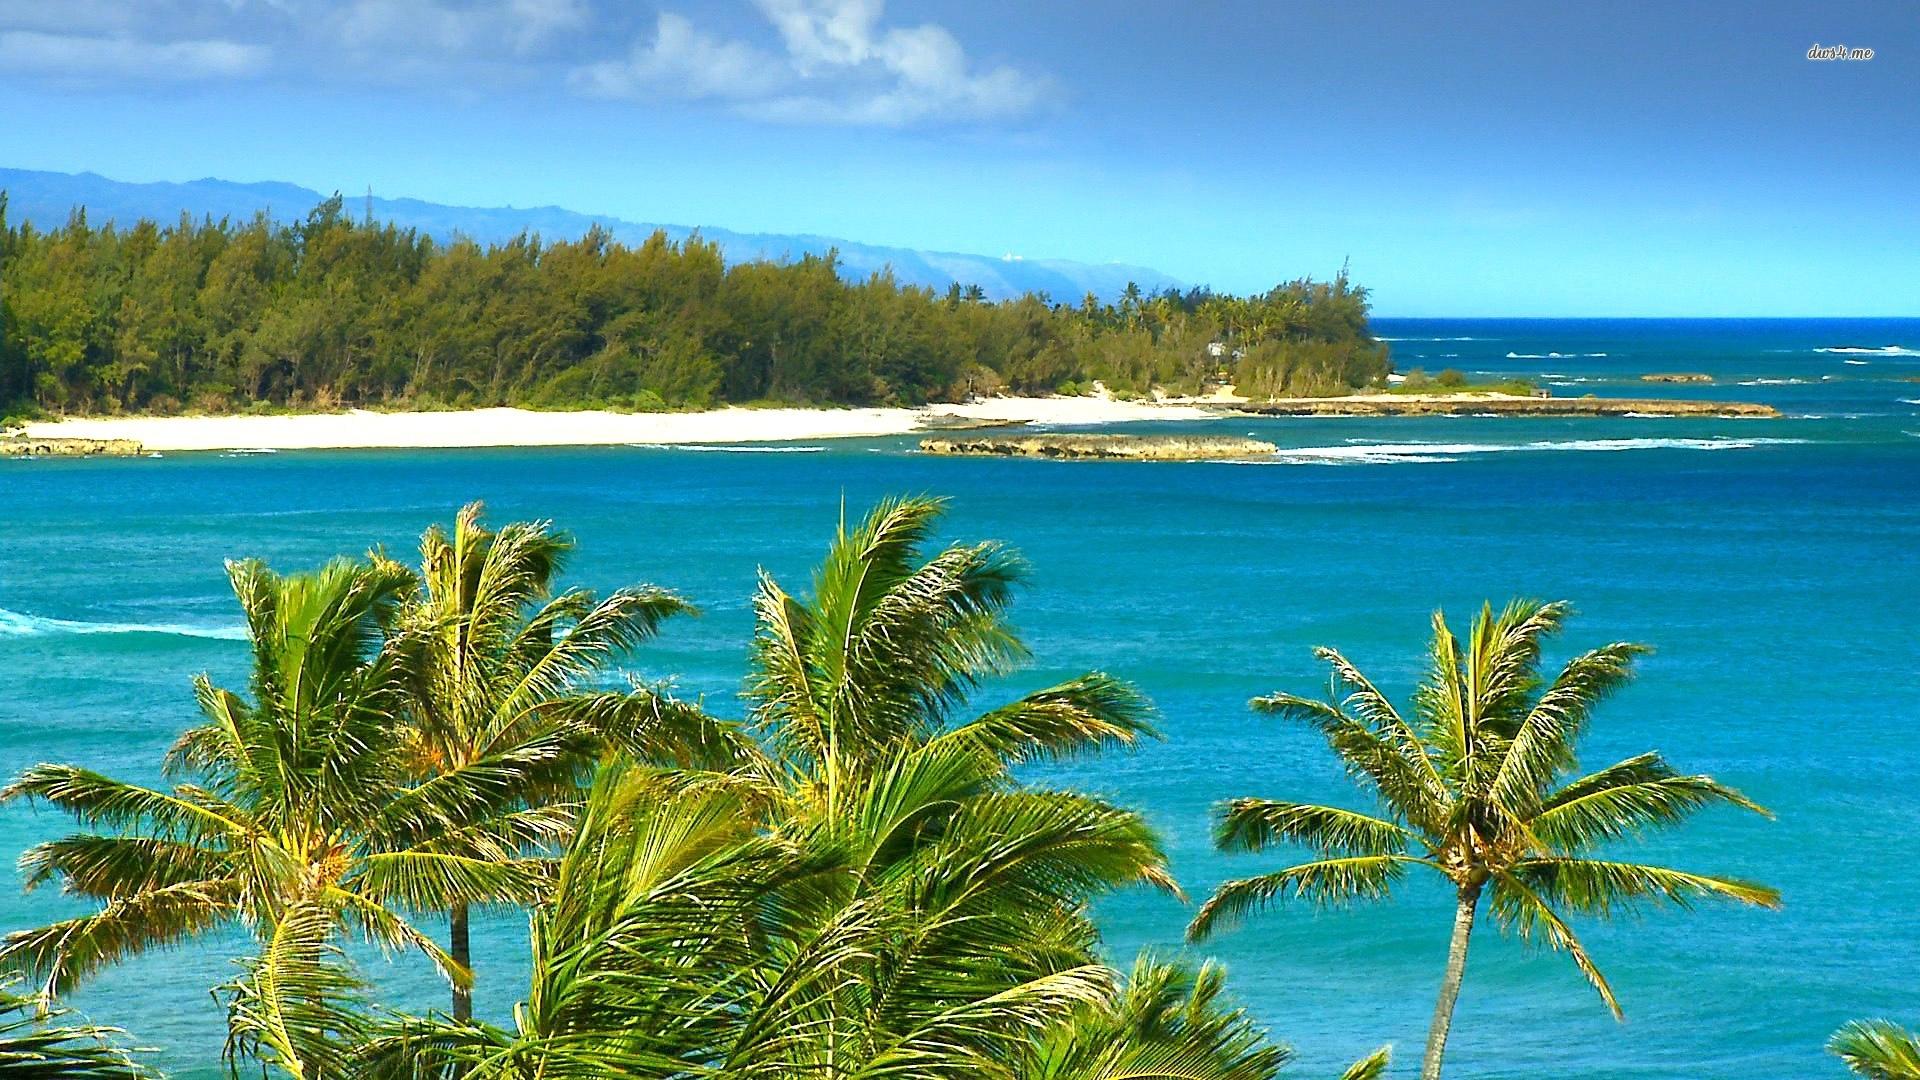 Hawaii Wallpapers, Live Hawaii Wallpapers, NJR51 Hawaii Backgrounds